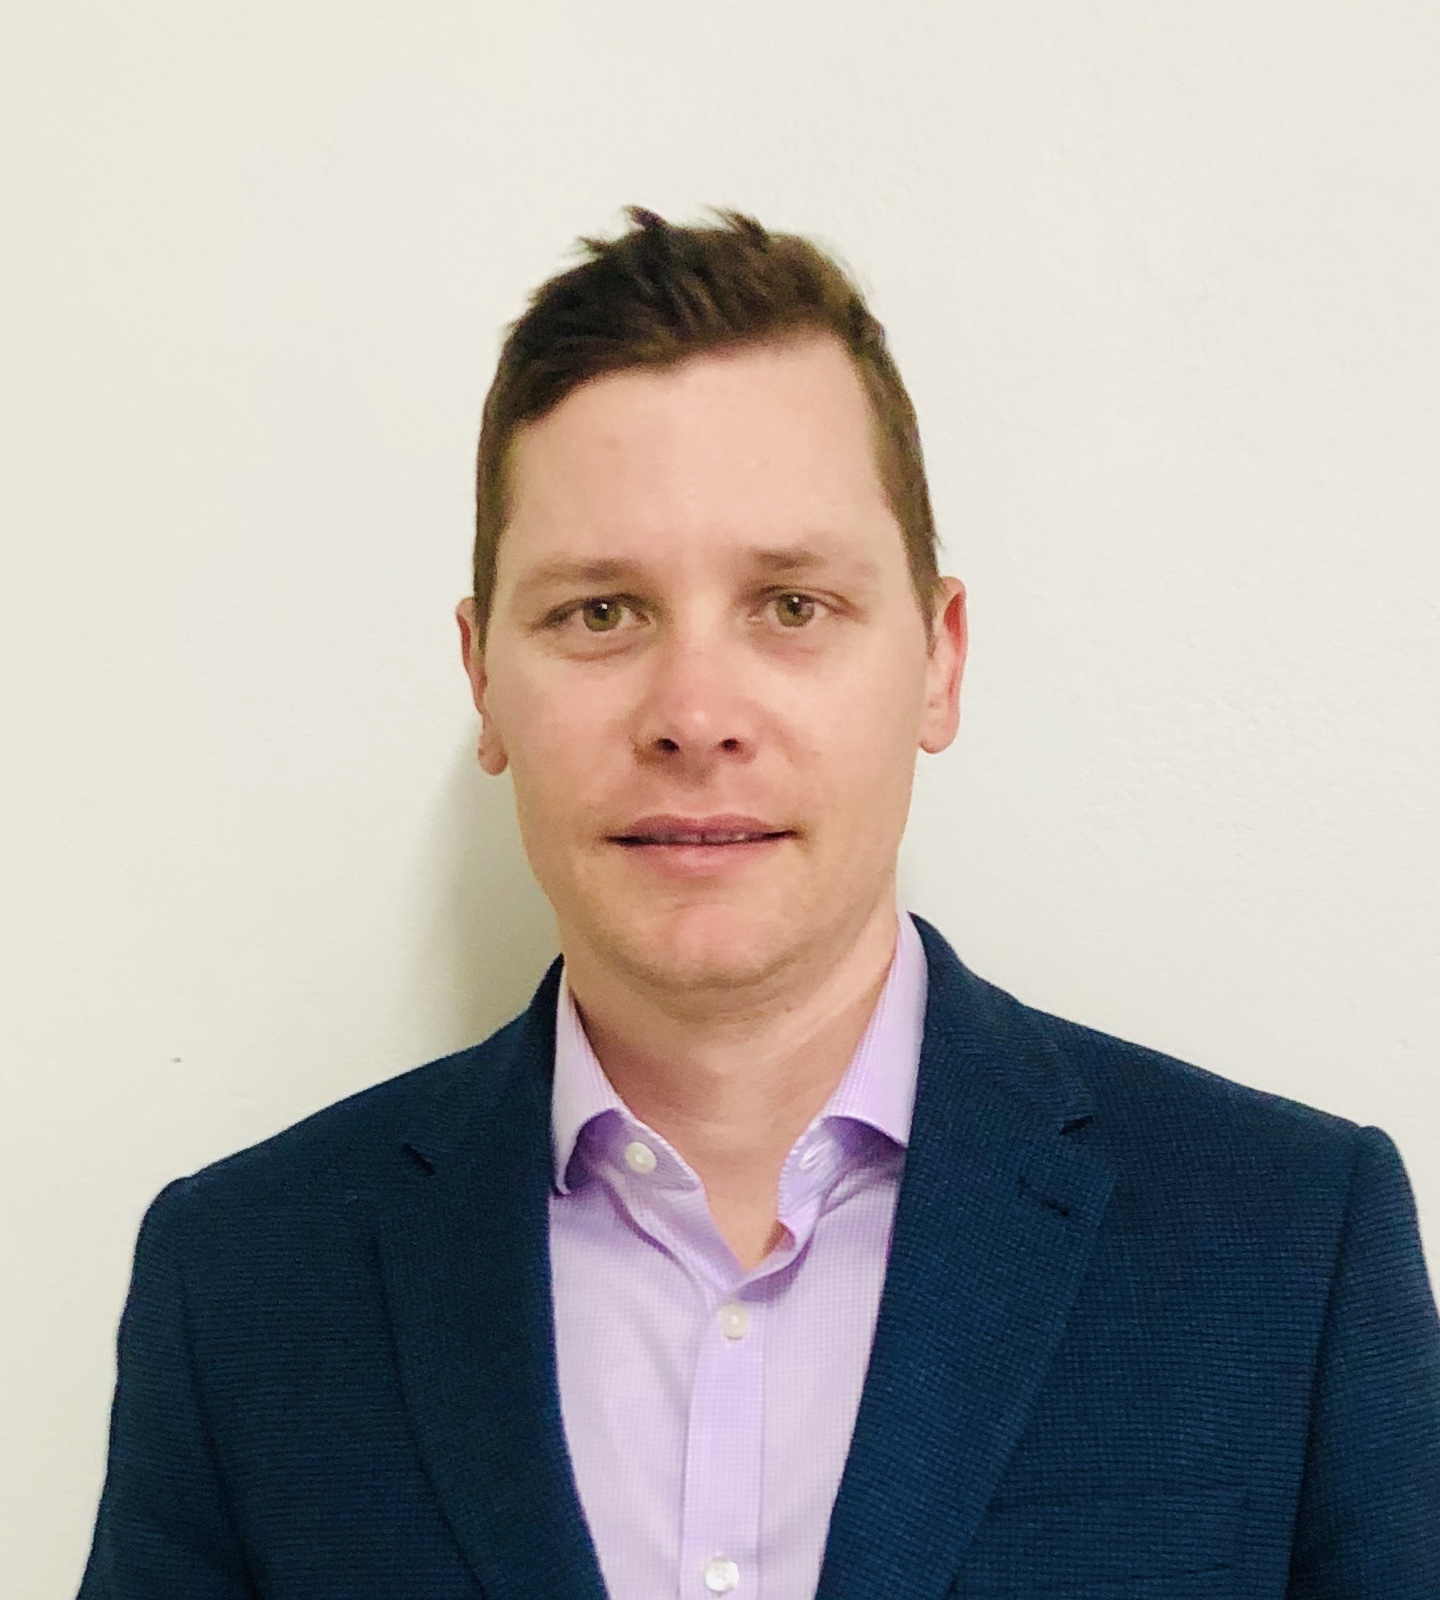 Gary Peel, Head of ITEXACT South Africa